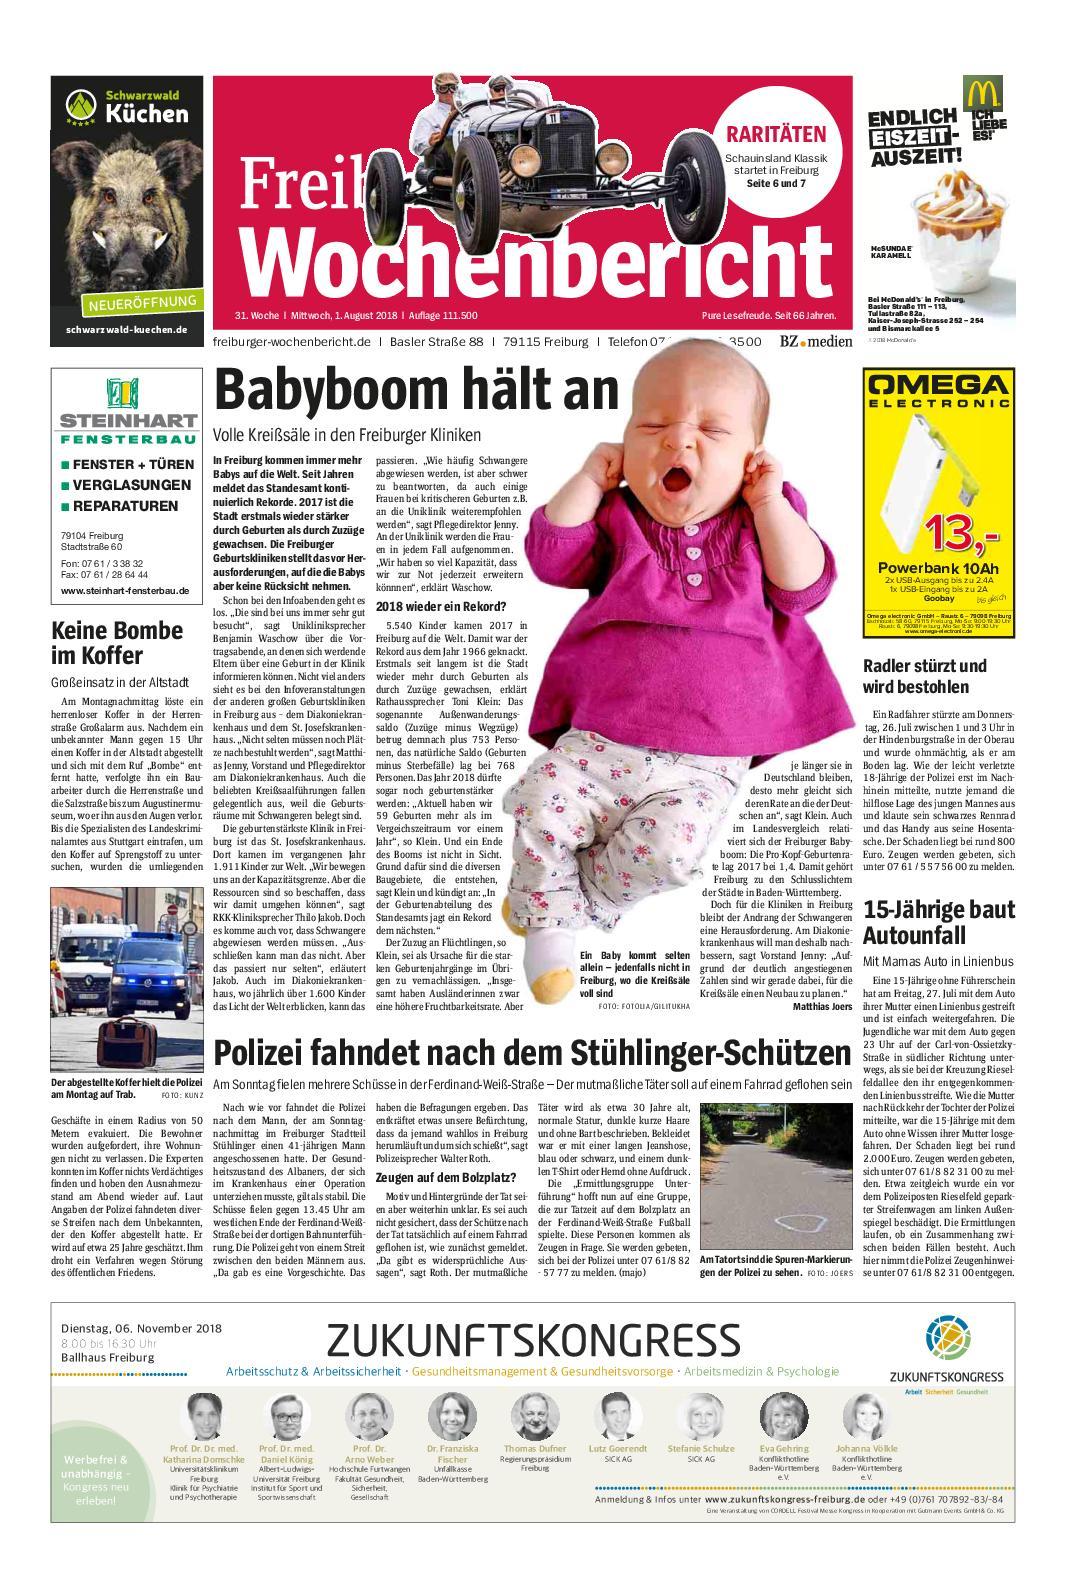 Ordentlich Winterhalder & Hofmeier Gmbh Neustadt Baden Originaler Schlagstempel Antiquitäten & Kunst